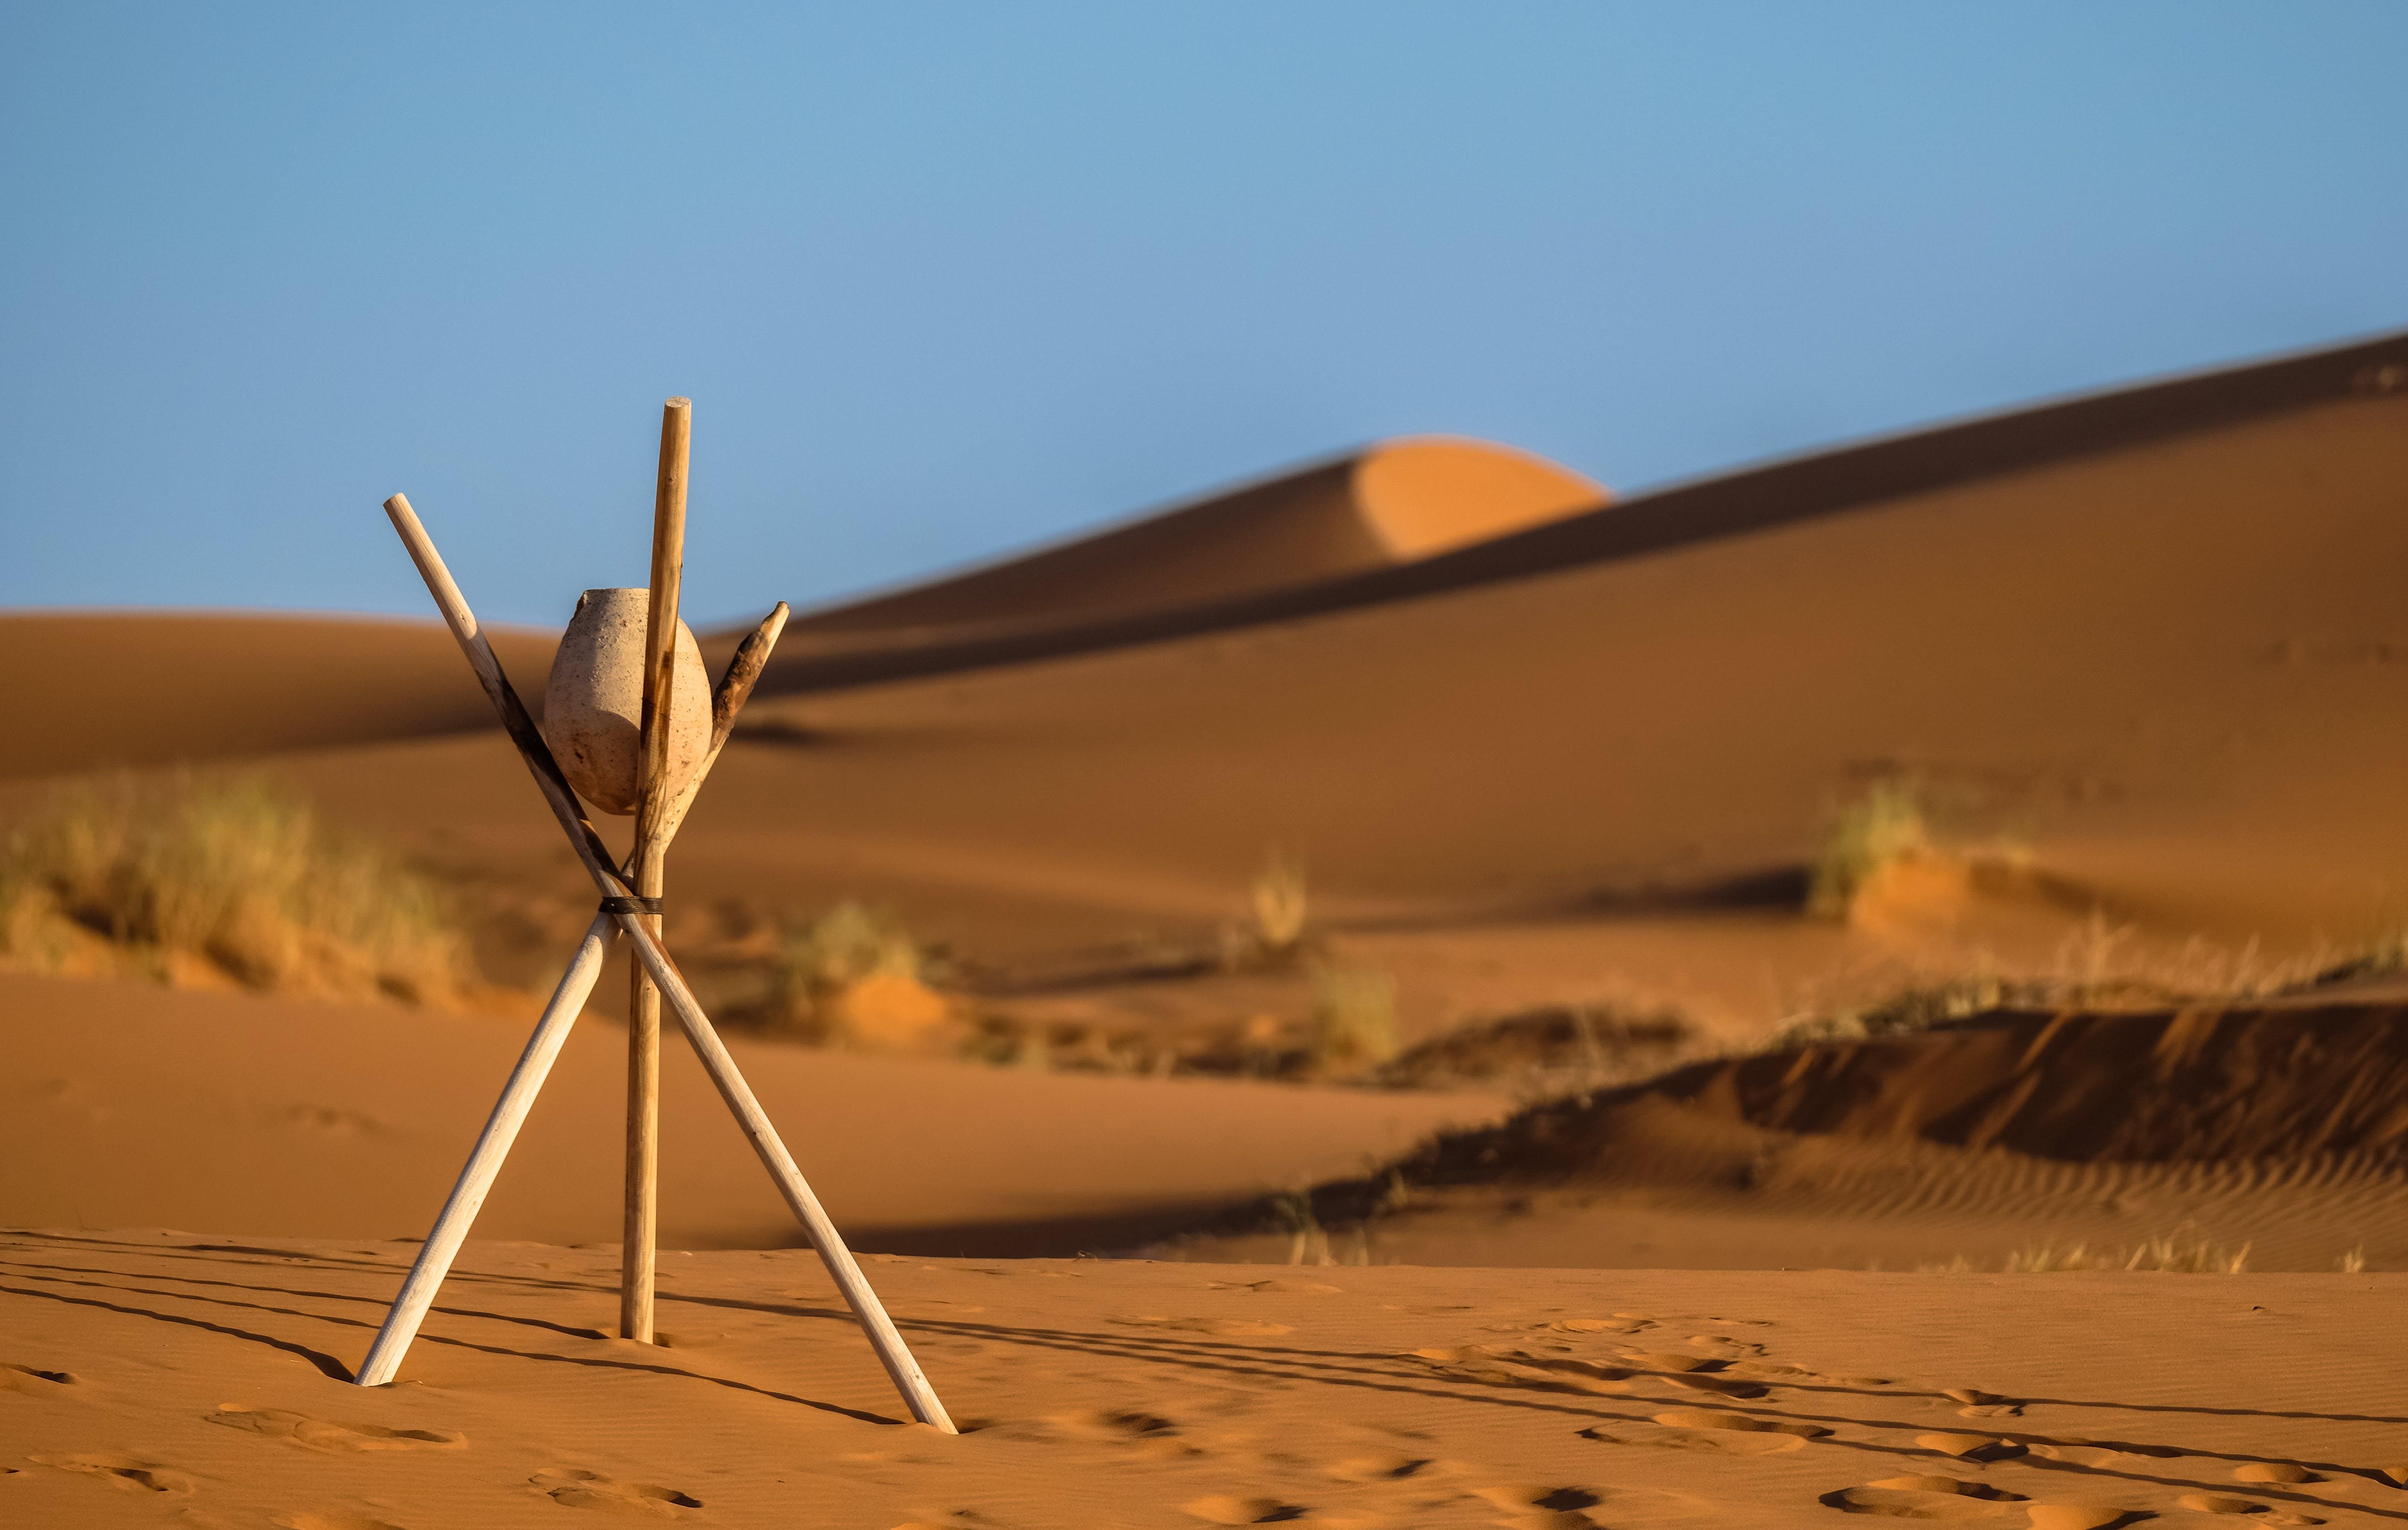 Brown Stone on Tripod Sticks at a Desert